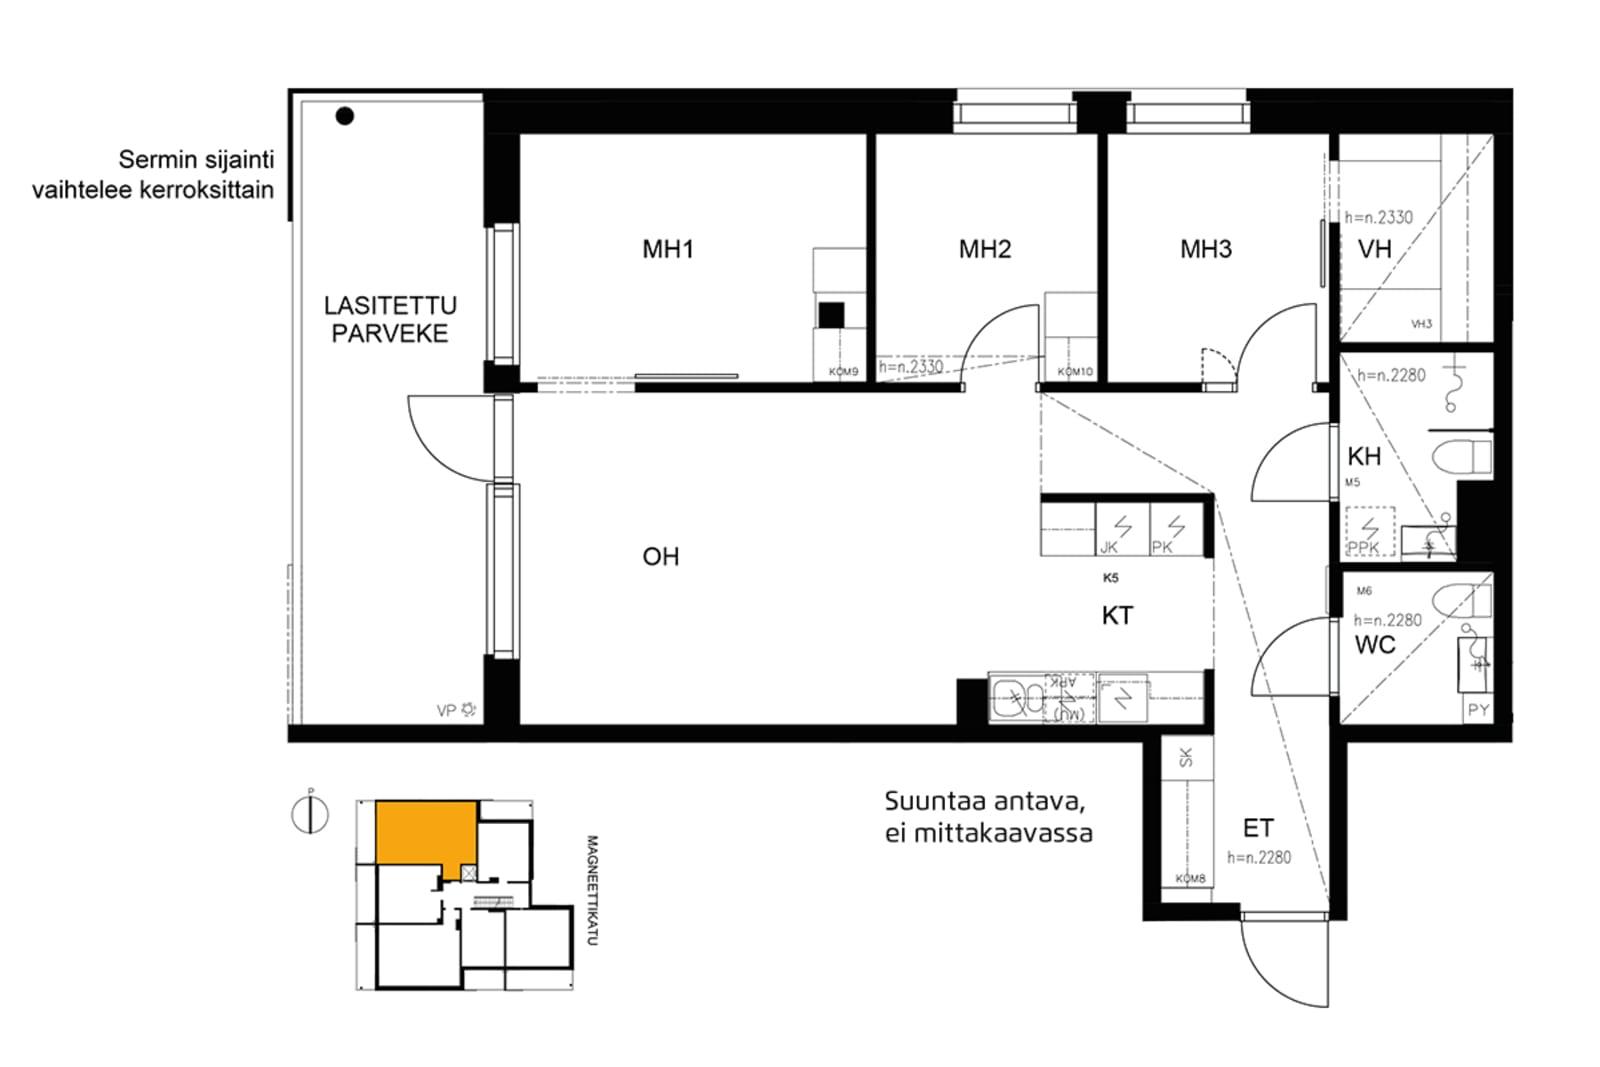 Espoo, Saunalahti, Magneettikatu 8 A 022